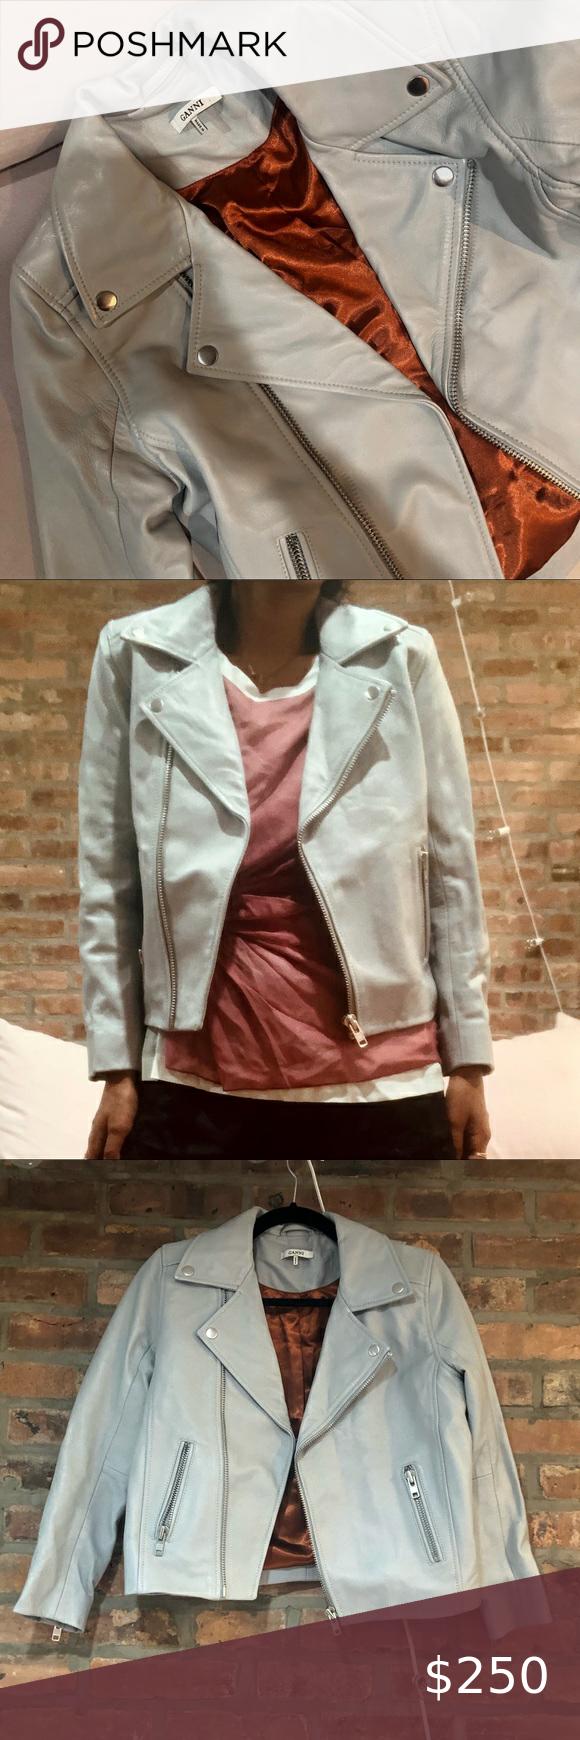 Ganni Leather Jacket Leather Jacket Leather Jacket Details Ganni Jacket [ 1740 x 580 Pixel ]